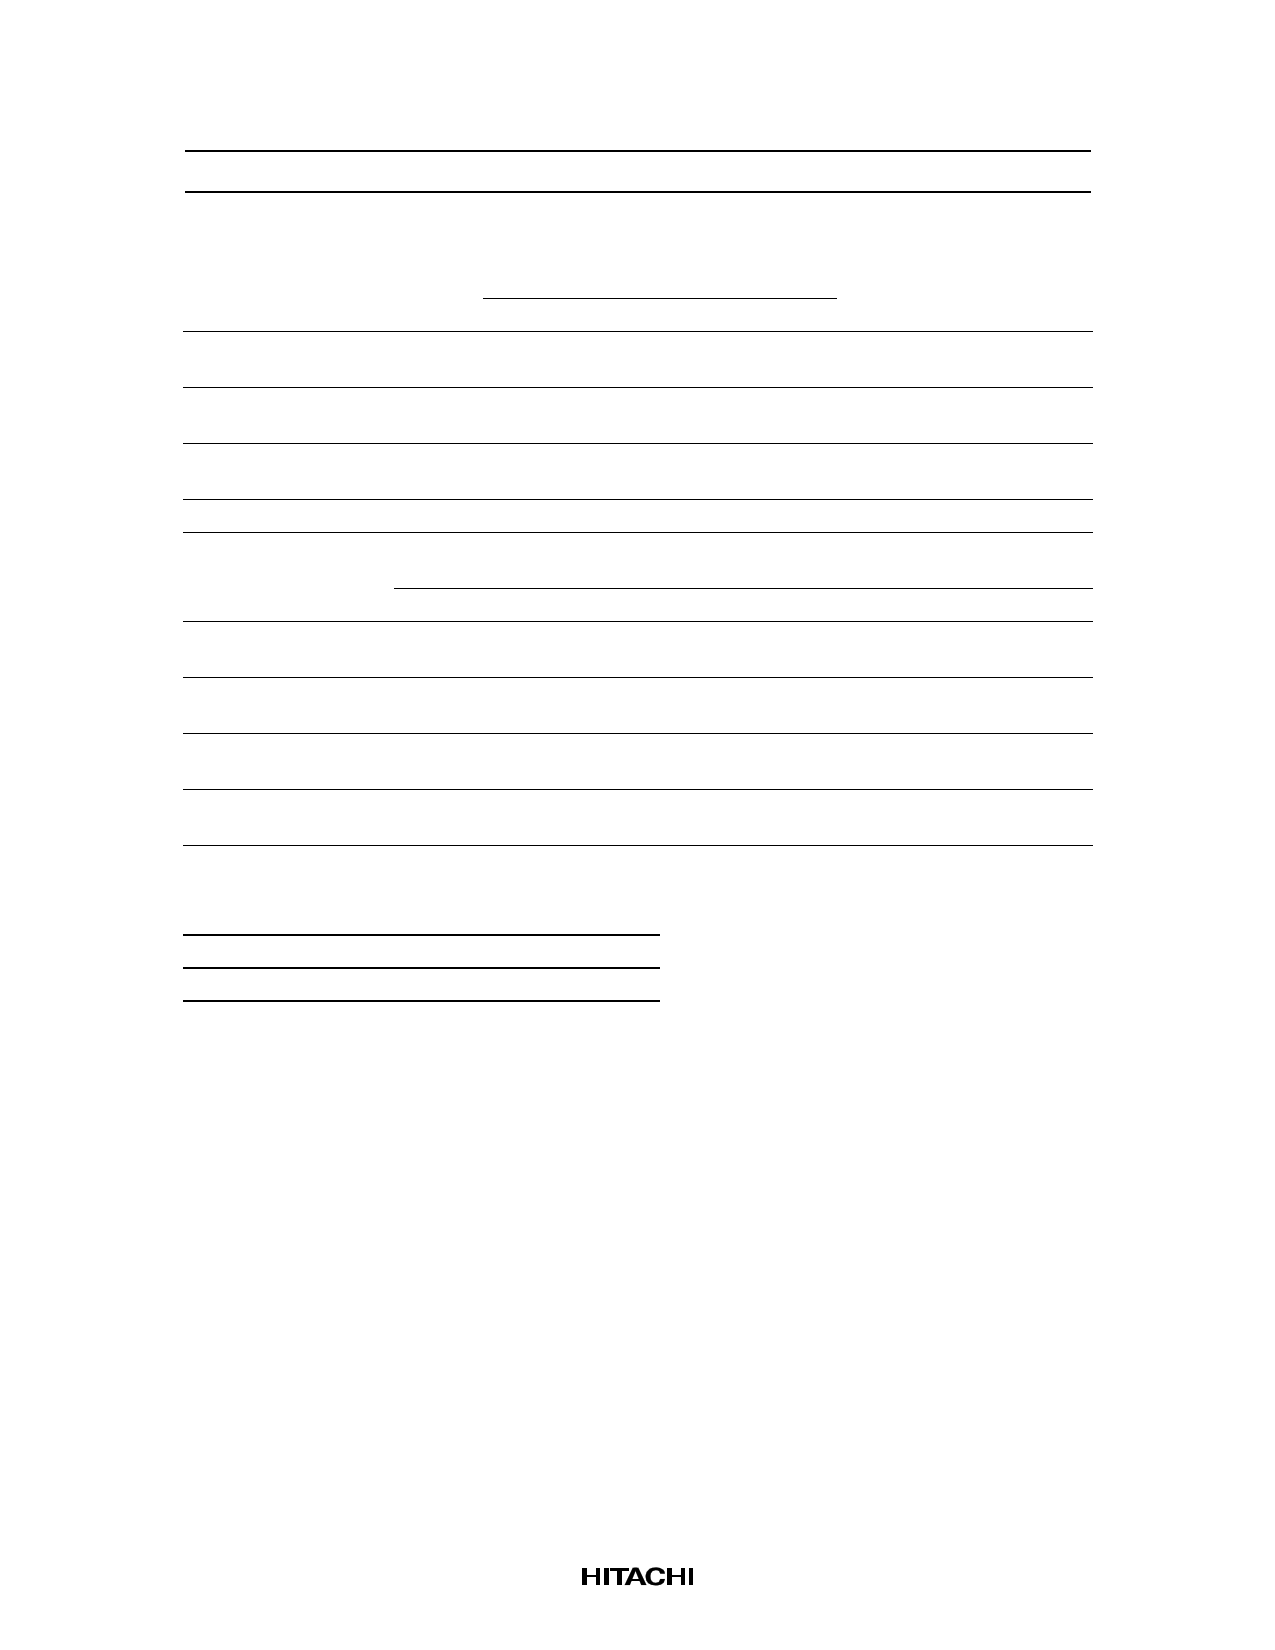 2SB648 pdf, schematic